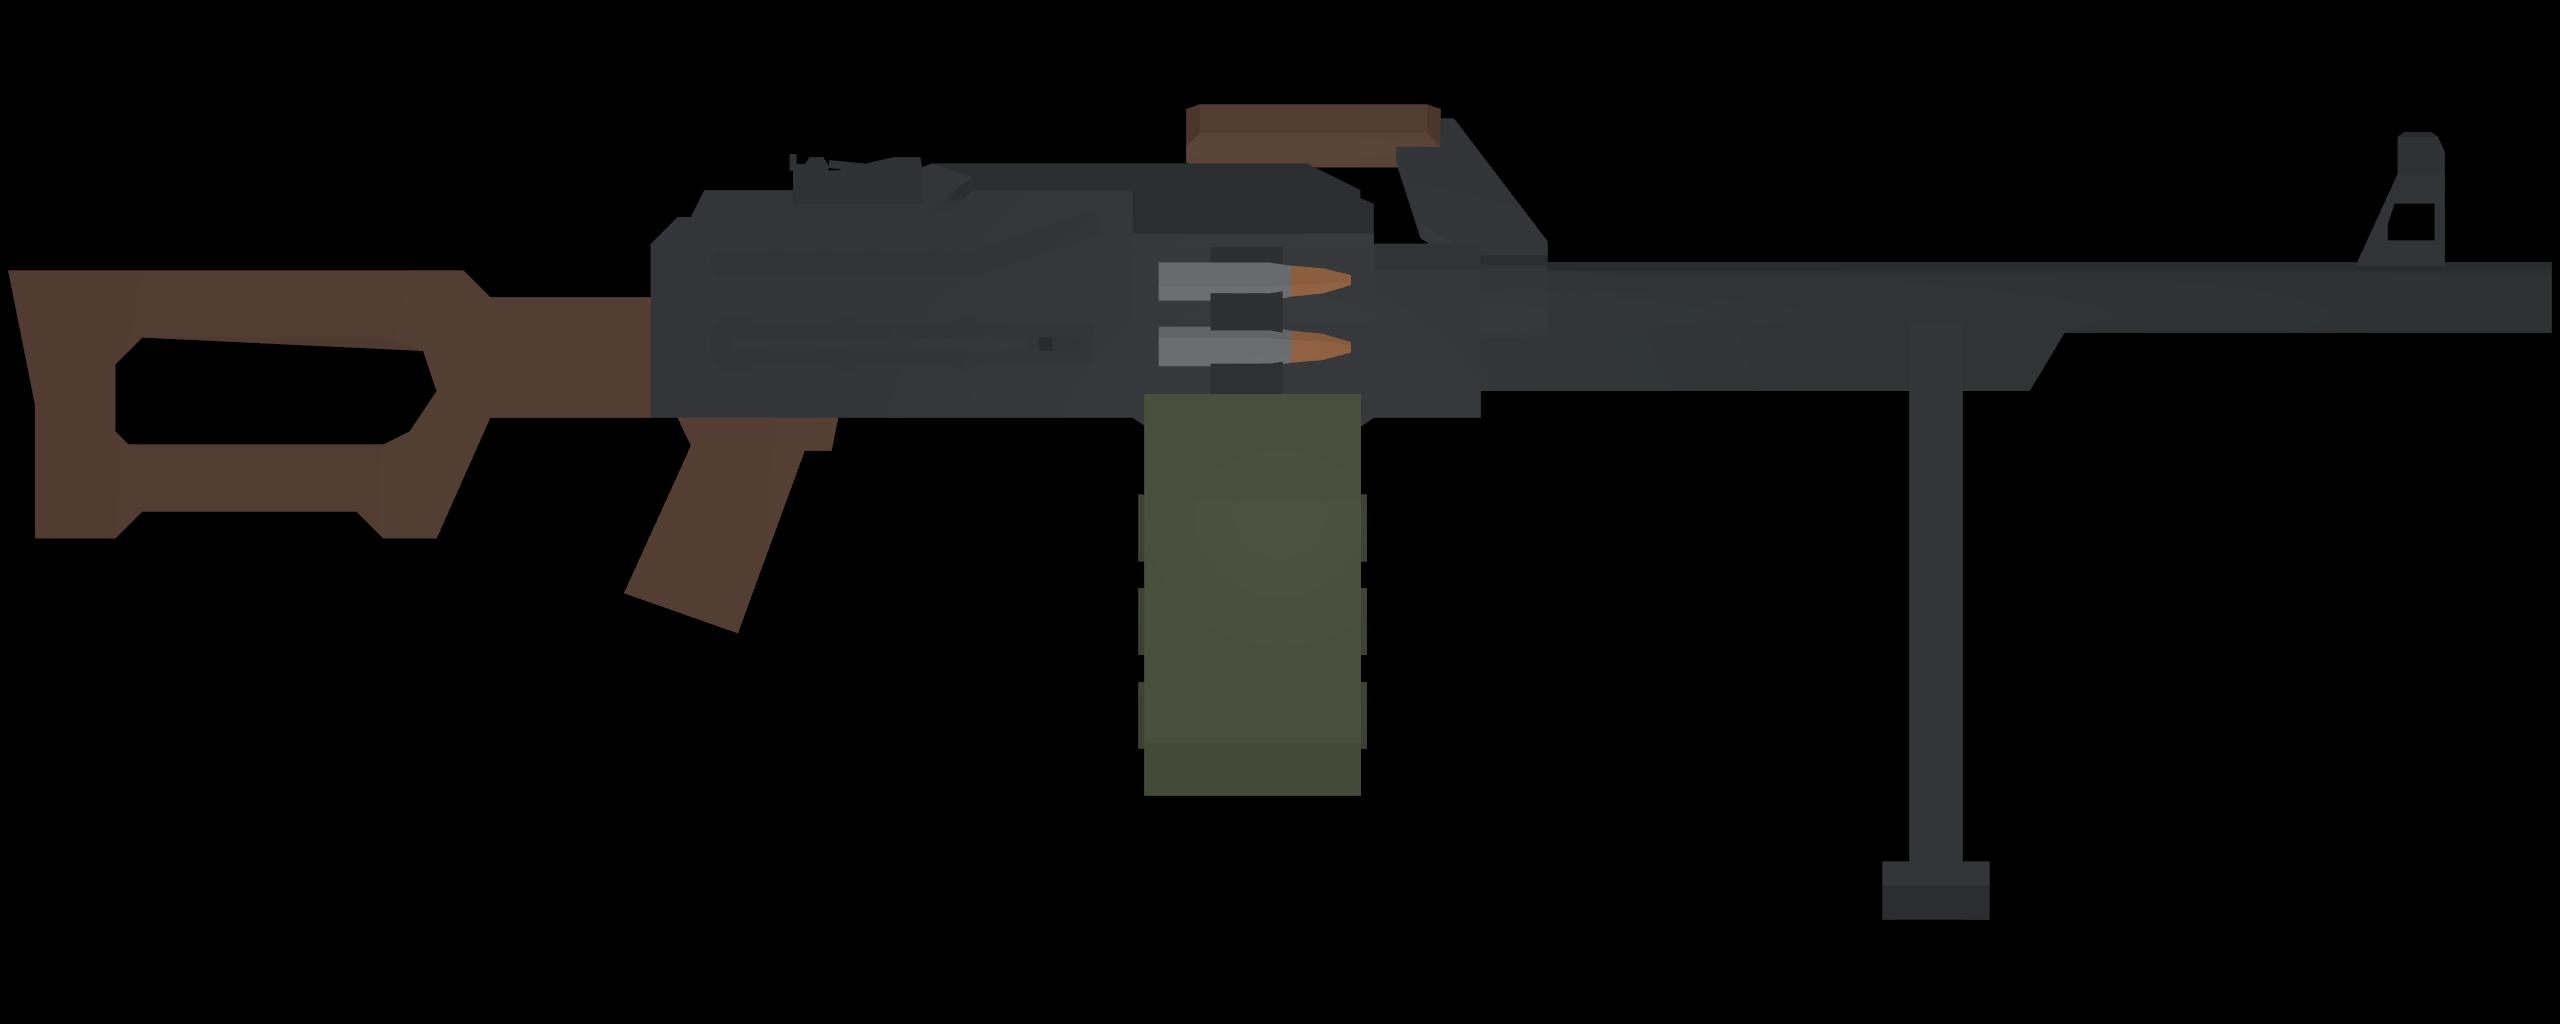 Unturned Uncreated Warfare Mods & All ID List + Attachments - Russian Weapons - 0B36FB6